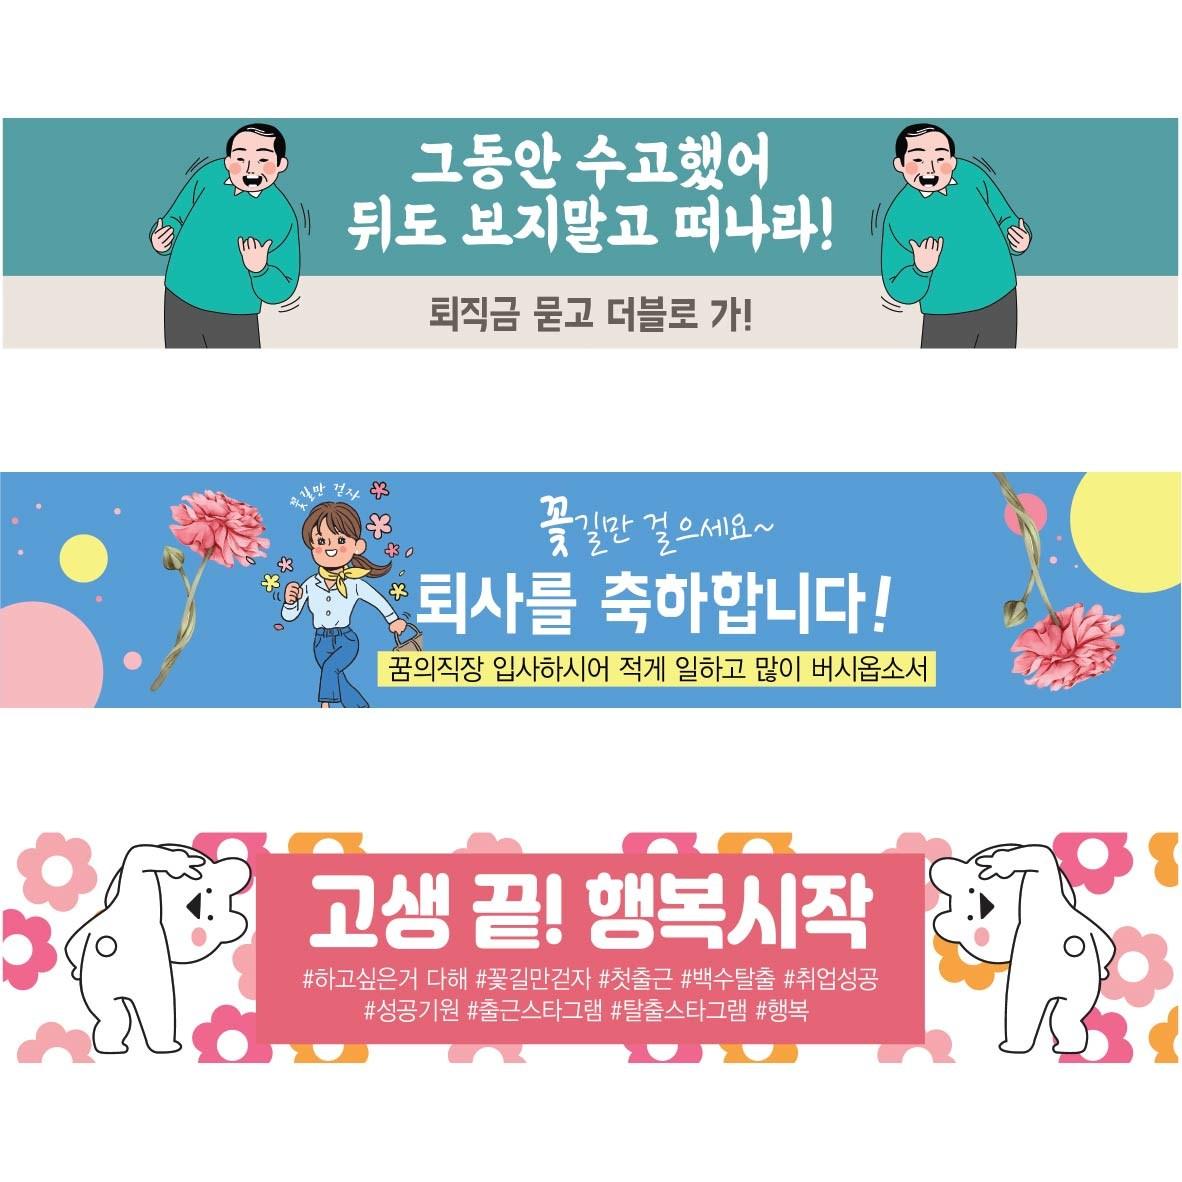 MADE 취업 퇴사 축하 기념 현수막, 재단